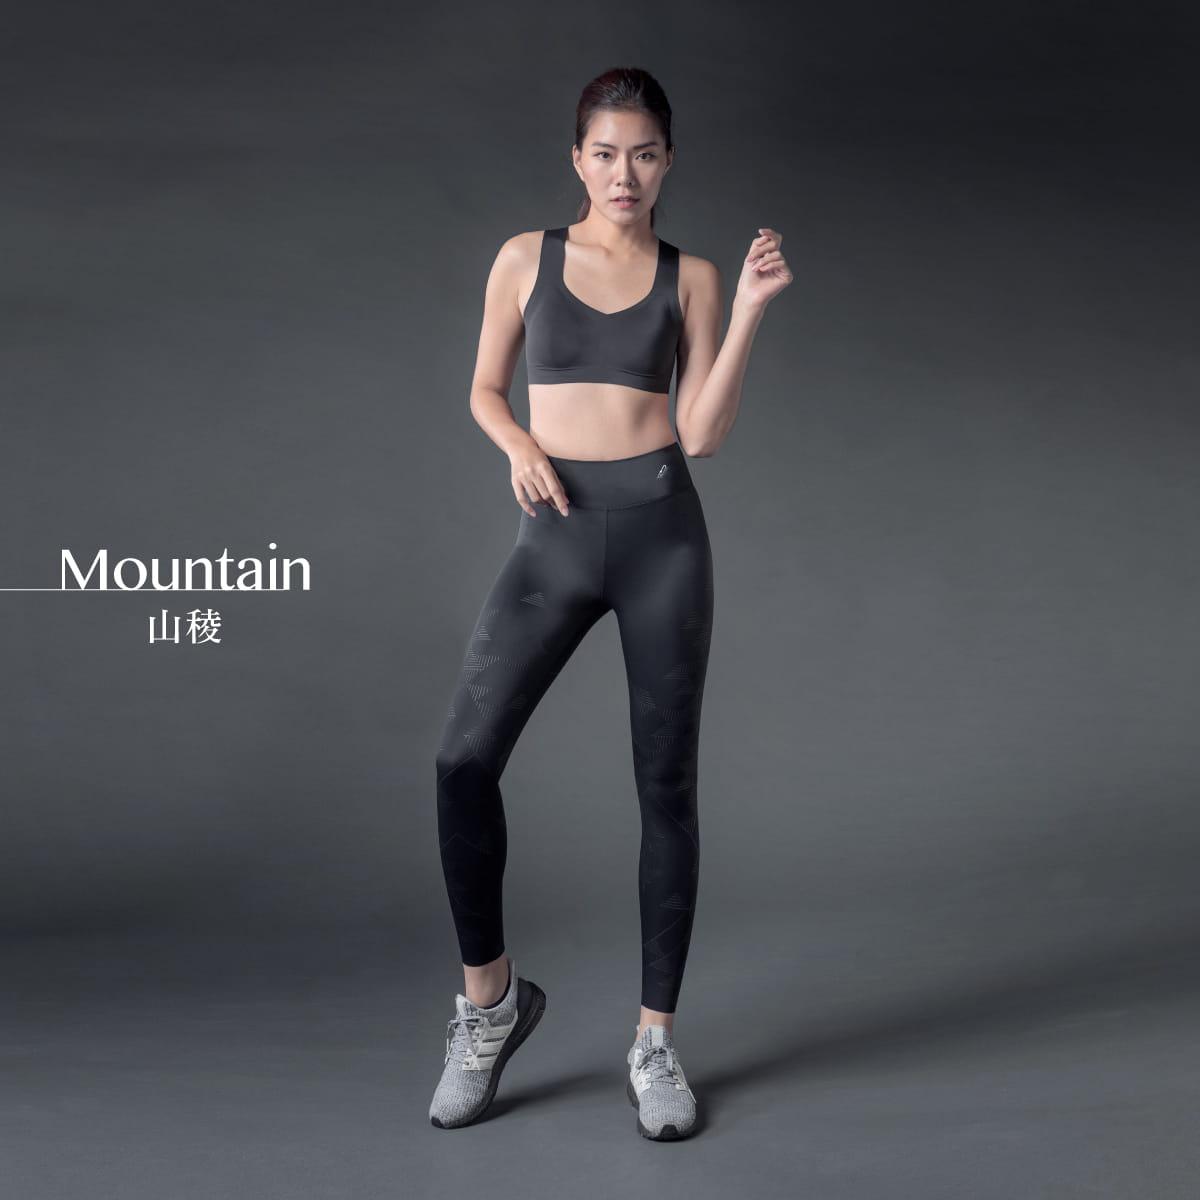 TENO超彈感美型健身褲-Mountain山稜 8